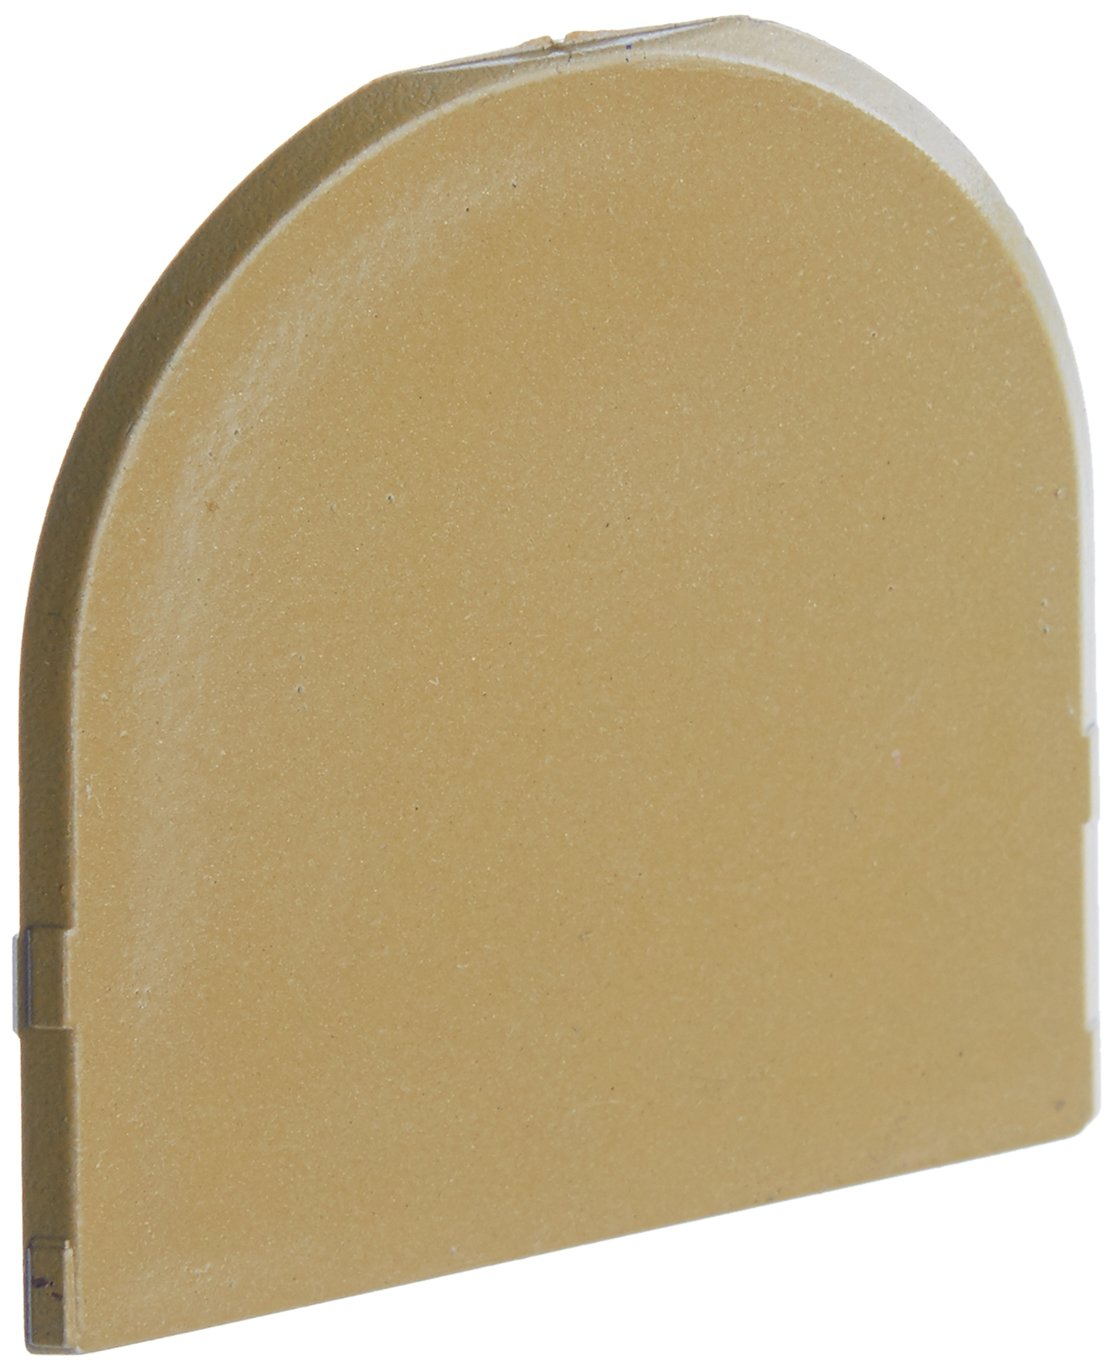 LCN 1460T163SB 1460T-163 696 Arm Insert Sprayed Brass Top Notch Distributors